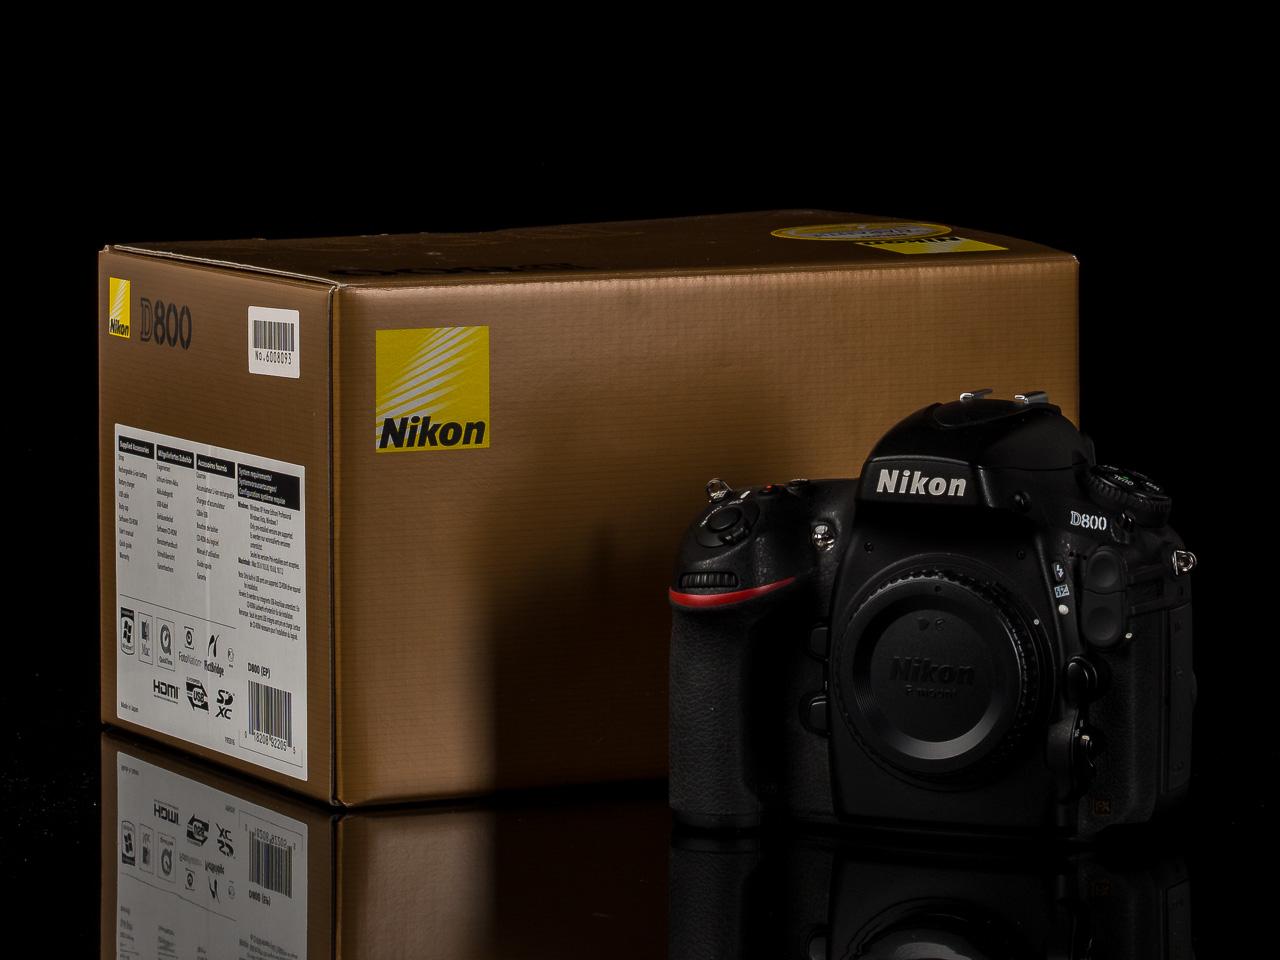 Grosser Nikon DSLR Kamera- und Objektiv-Verkauf